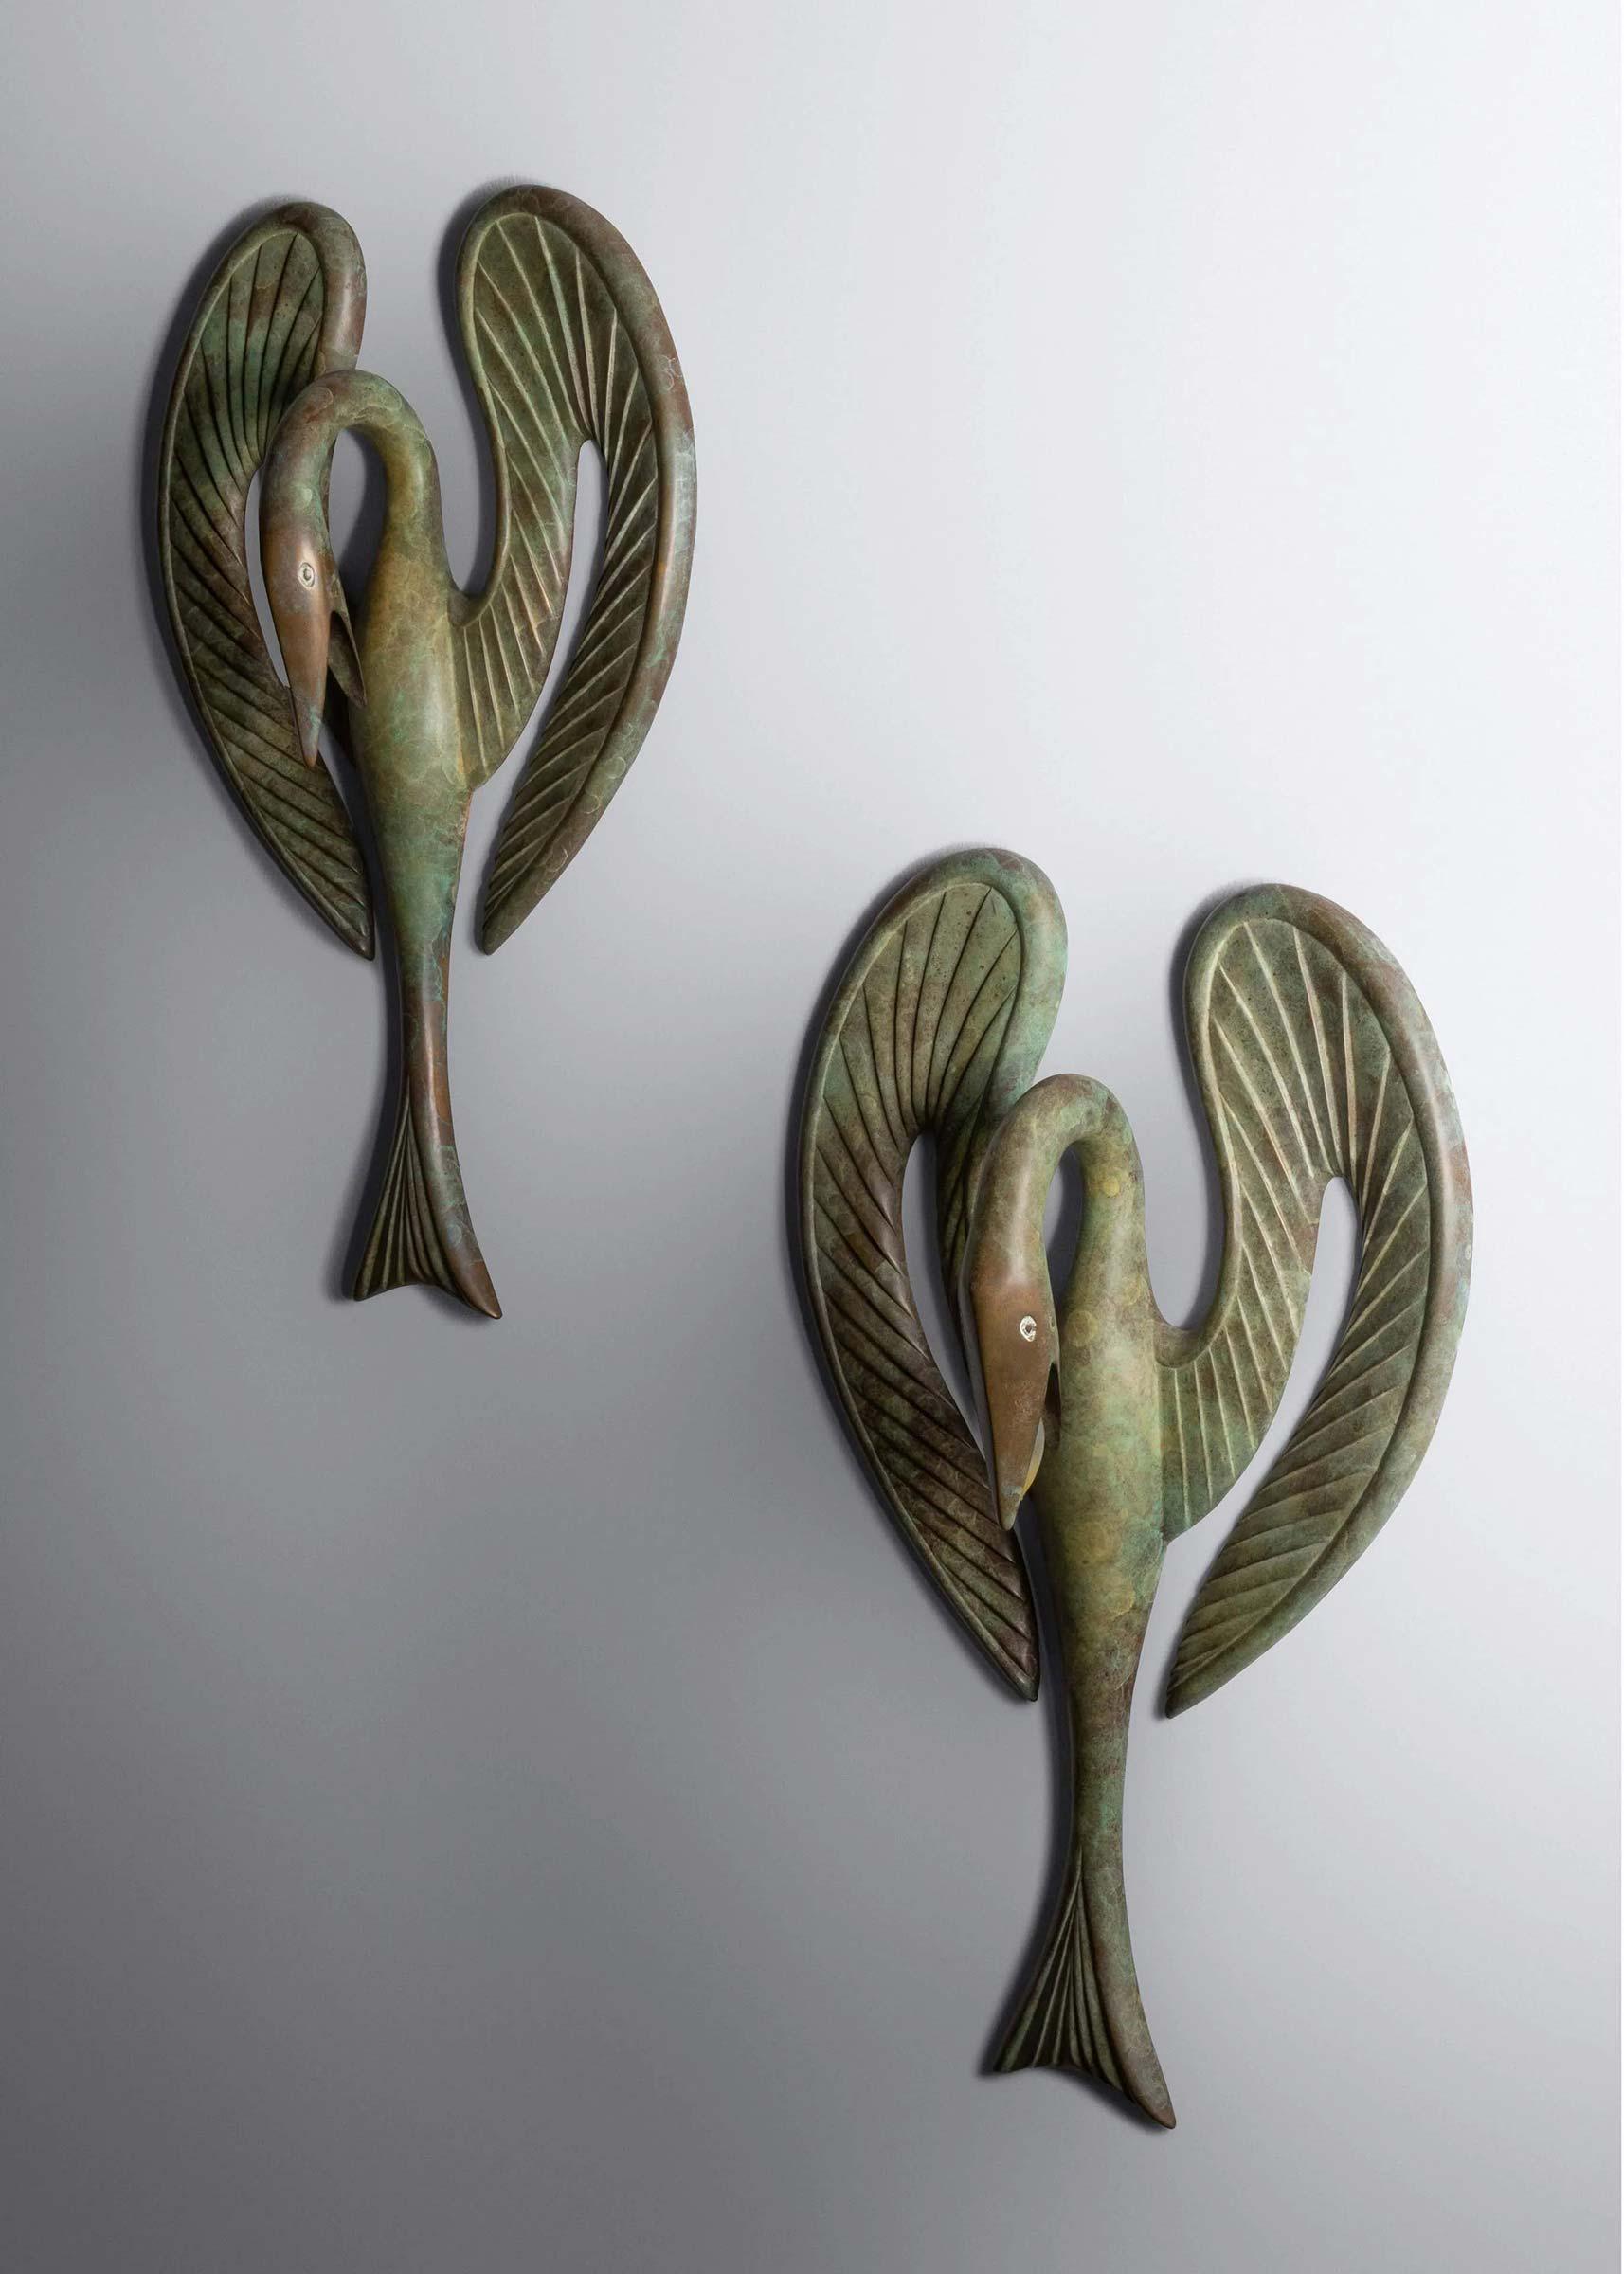 Judy Kensley McKie (b. 1944) Swan Sconces, 1994, $28,125. Image courtesy Hindman